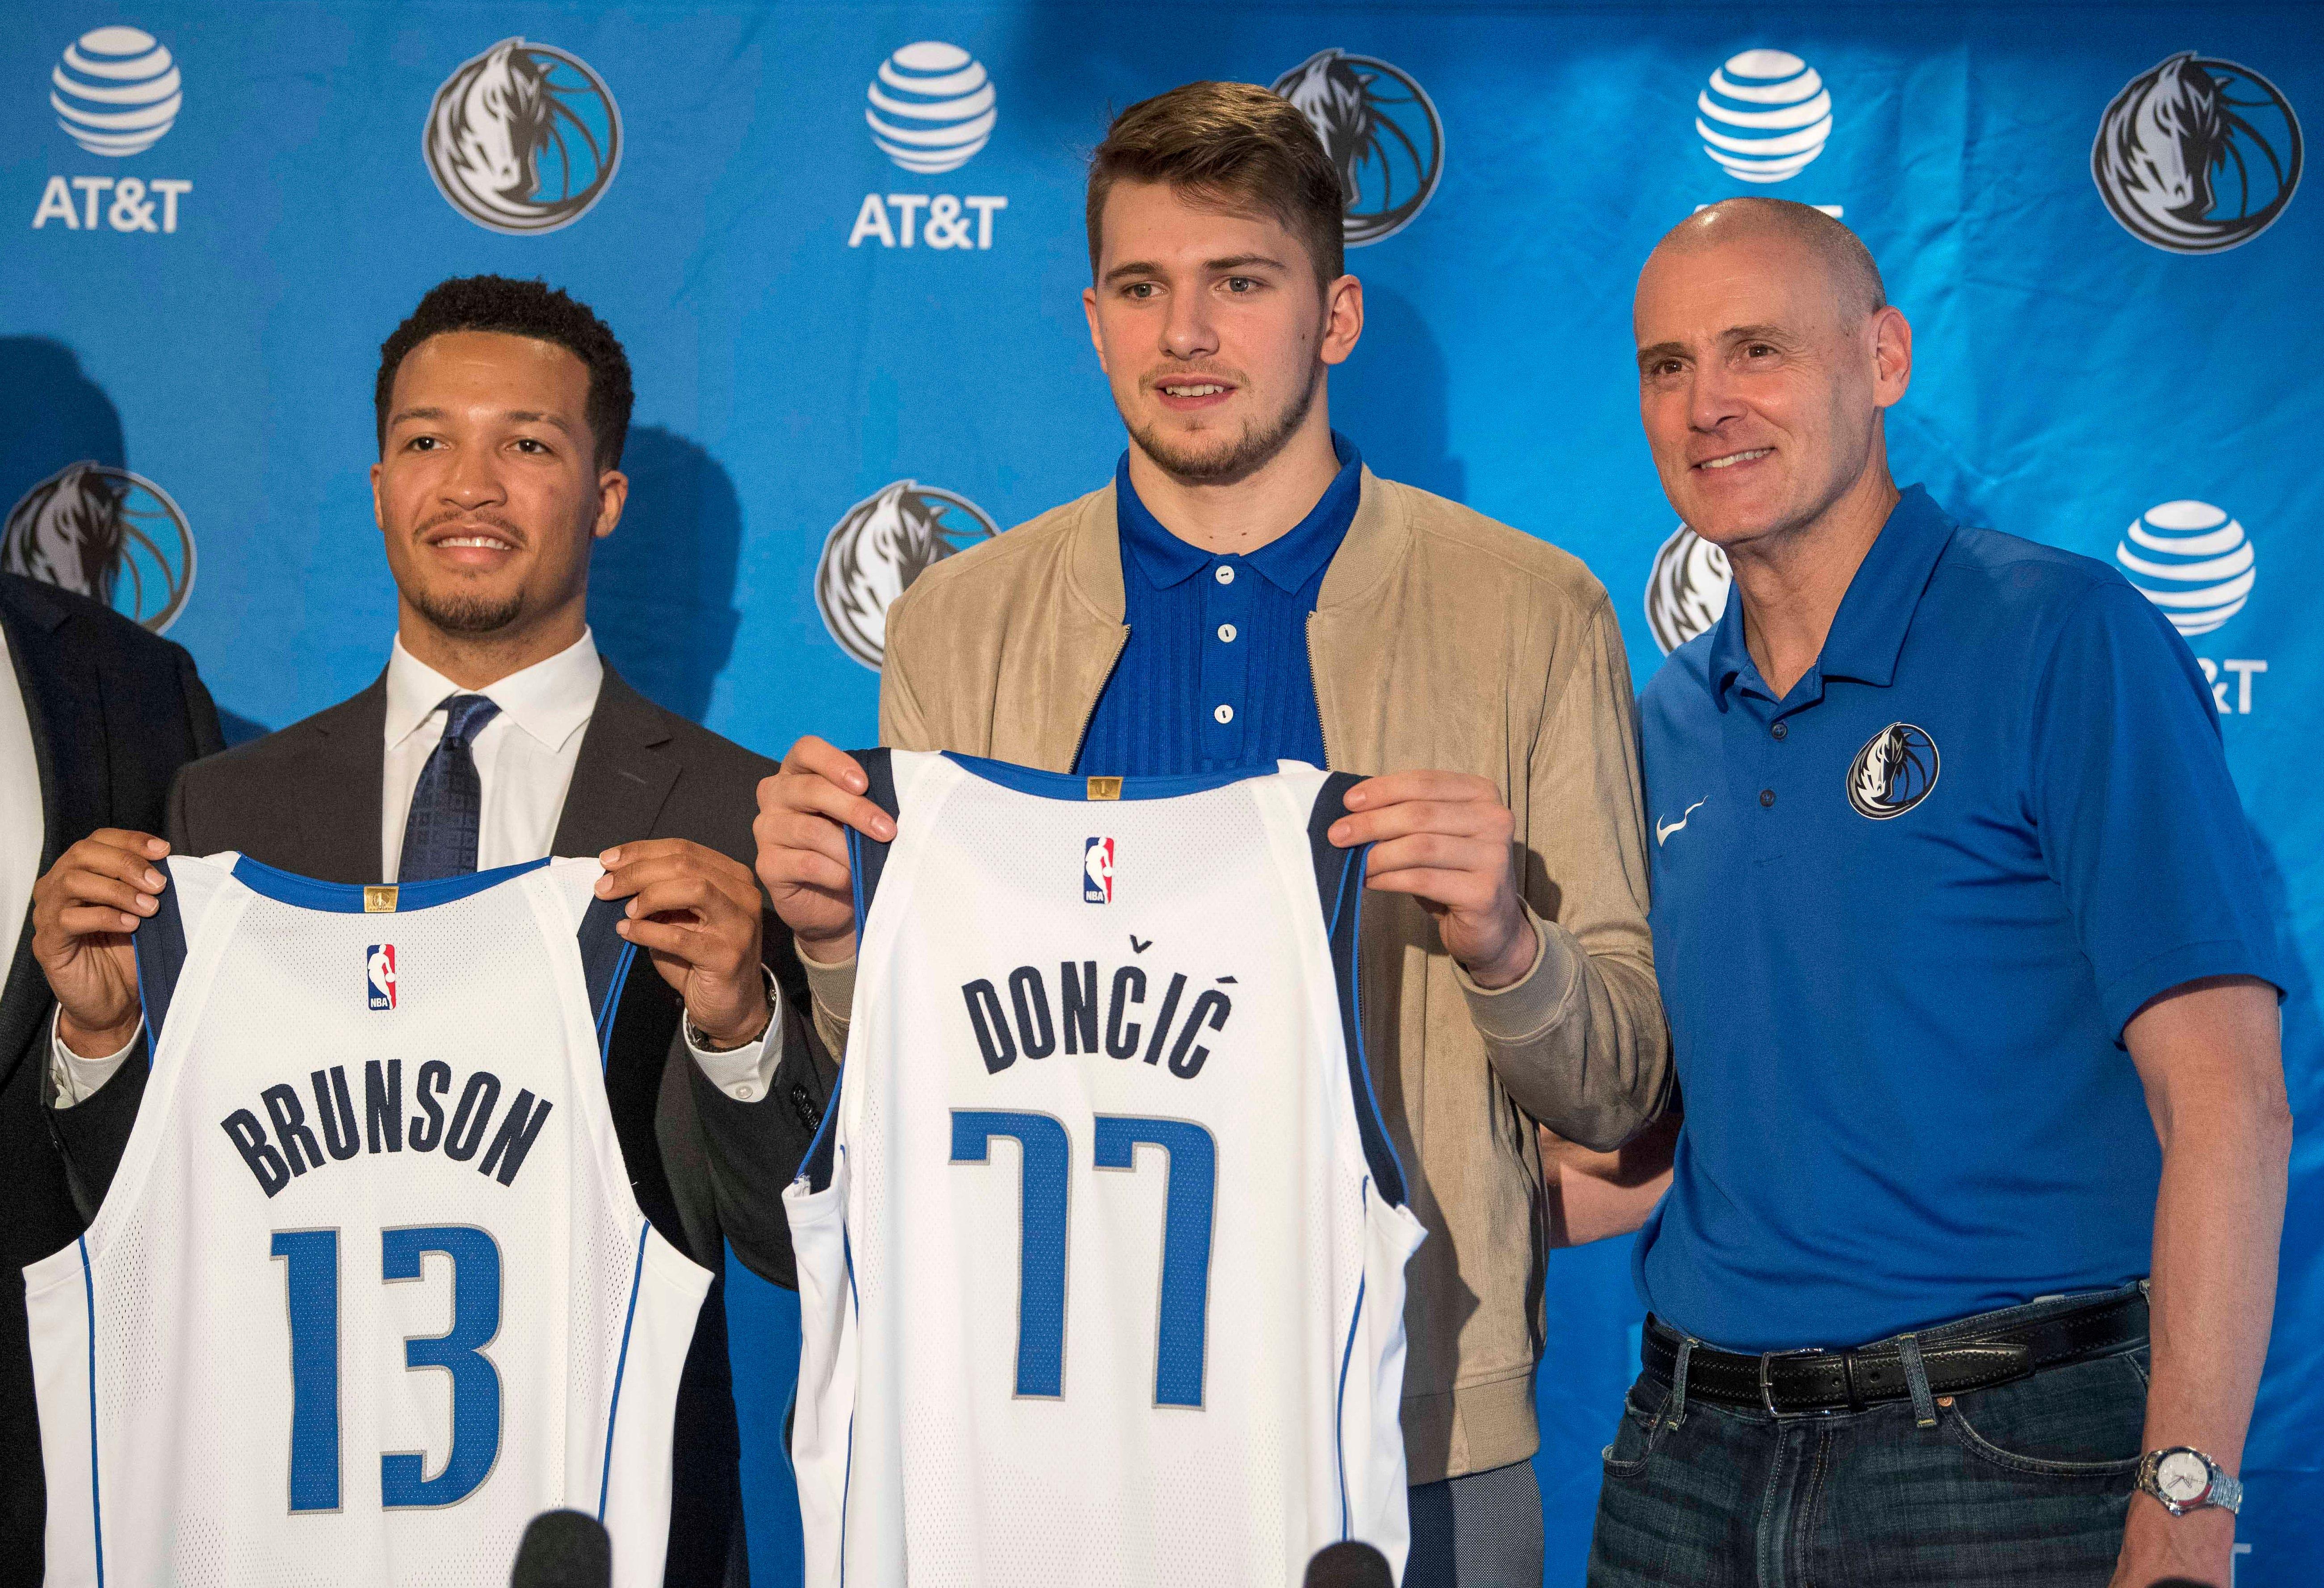 Mavericks believe European sensation Luka Doncic can be a cornerstone like Dirk Nowitzki